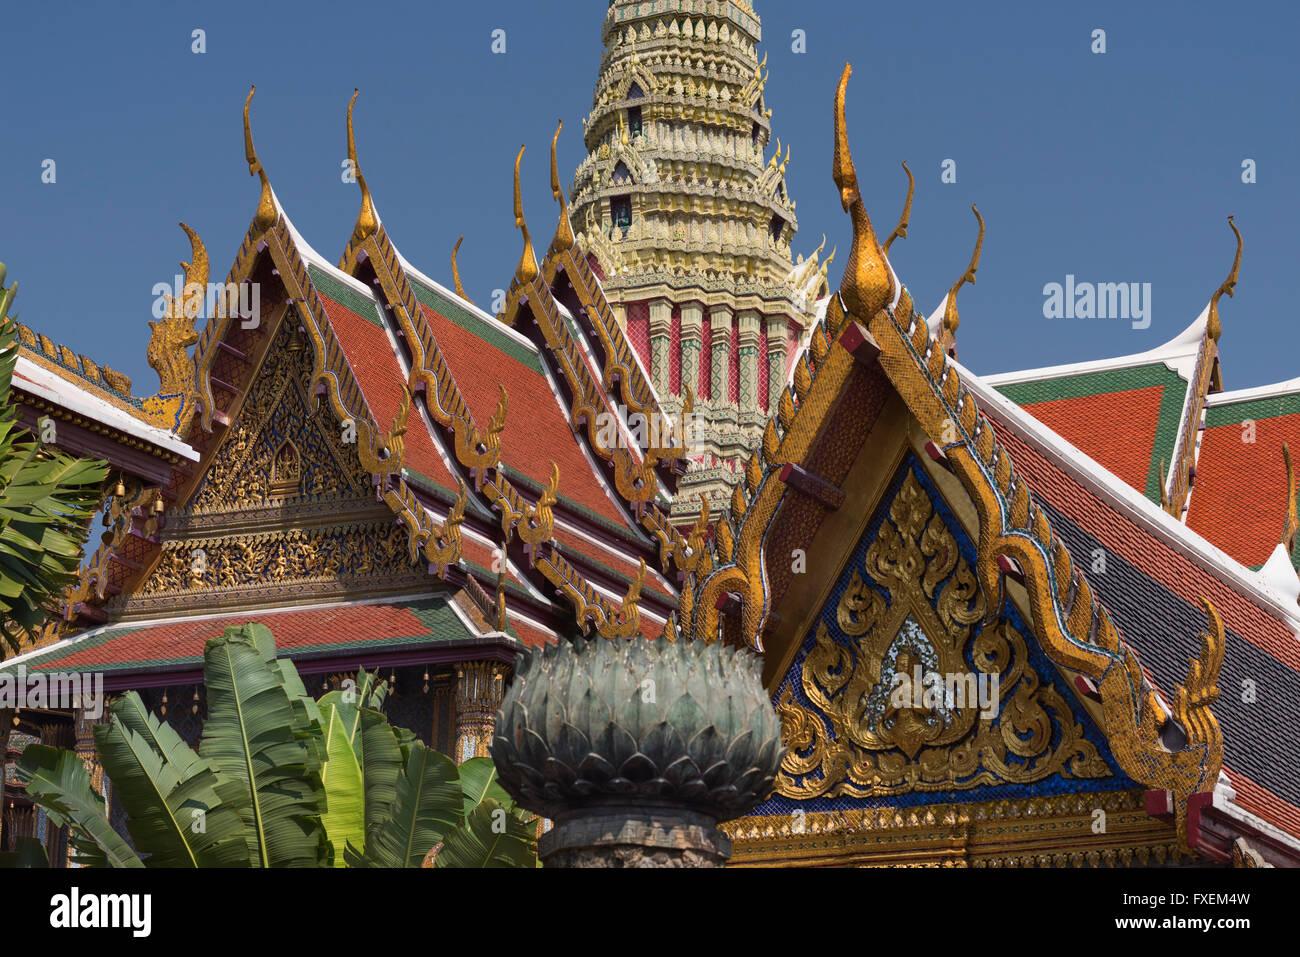 Wat Phra Kaew Grand Palace Bangkok Thailand - Stock Image